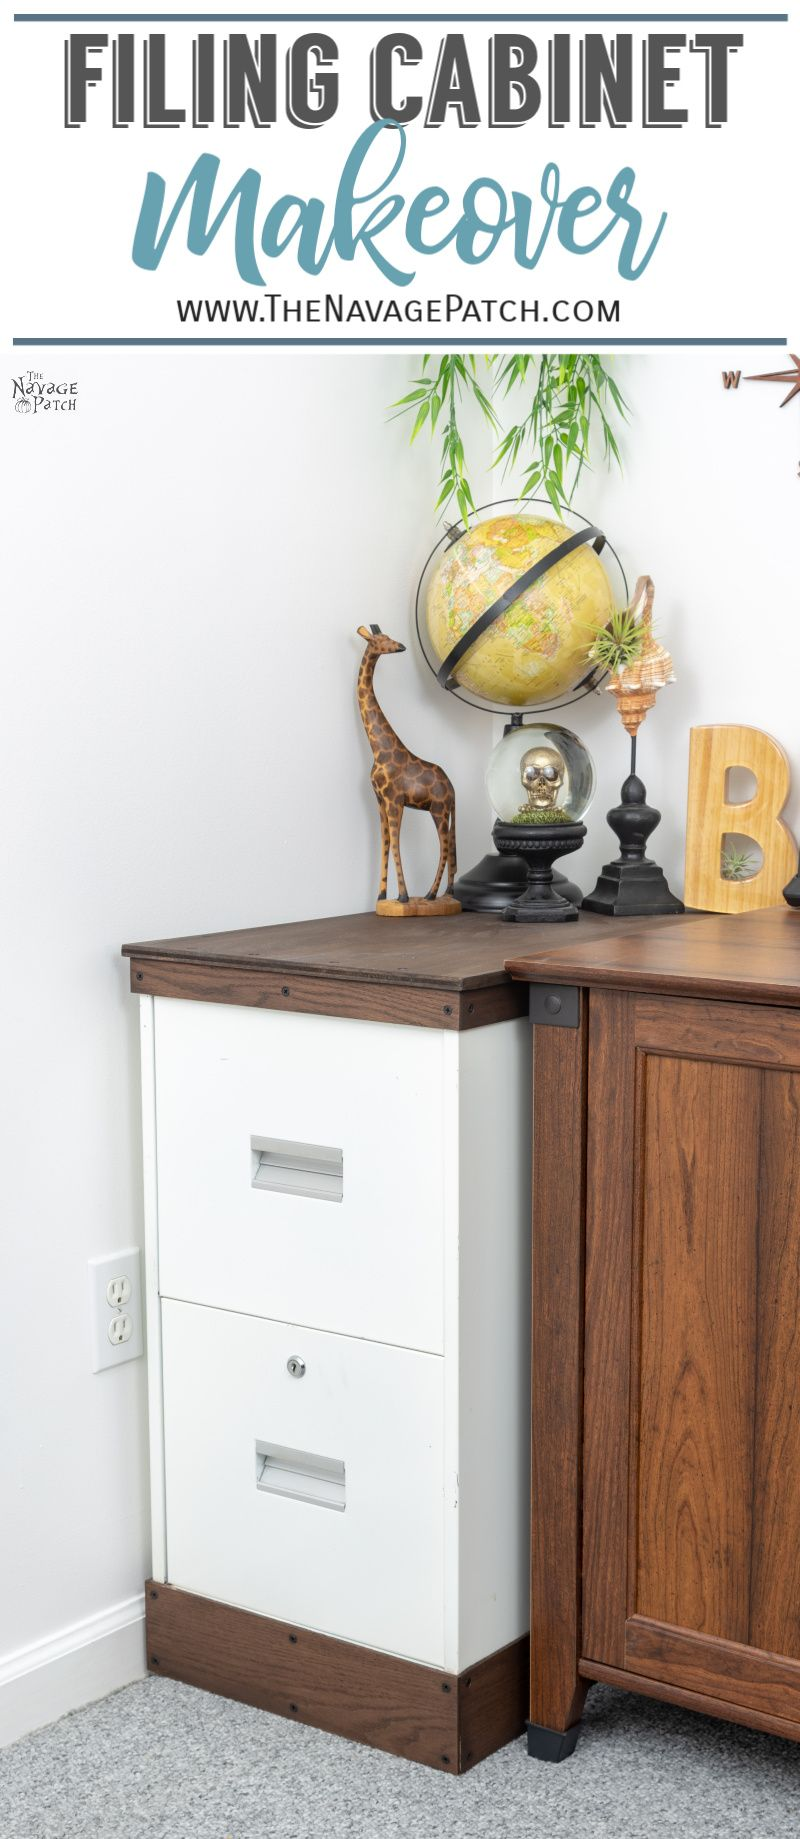 metal filing cabinet makeover pin image